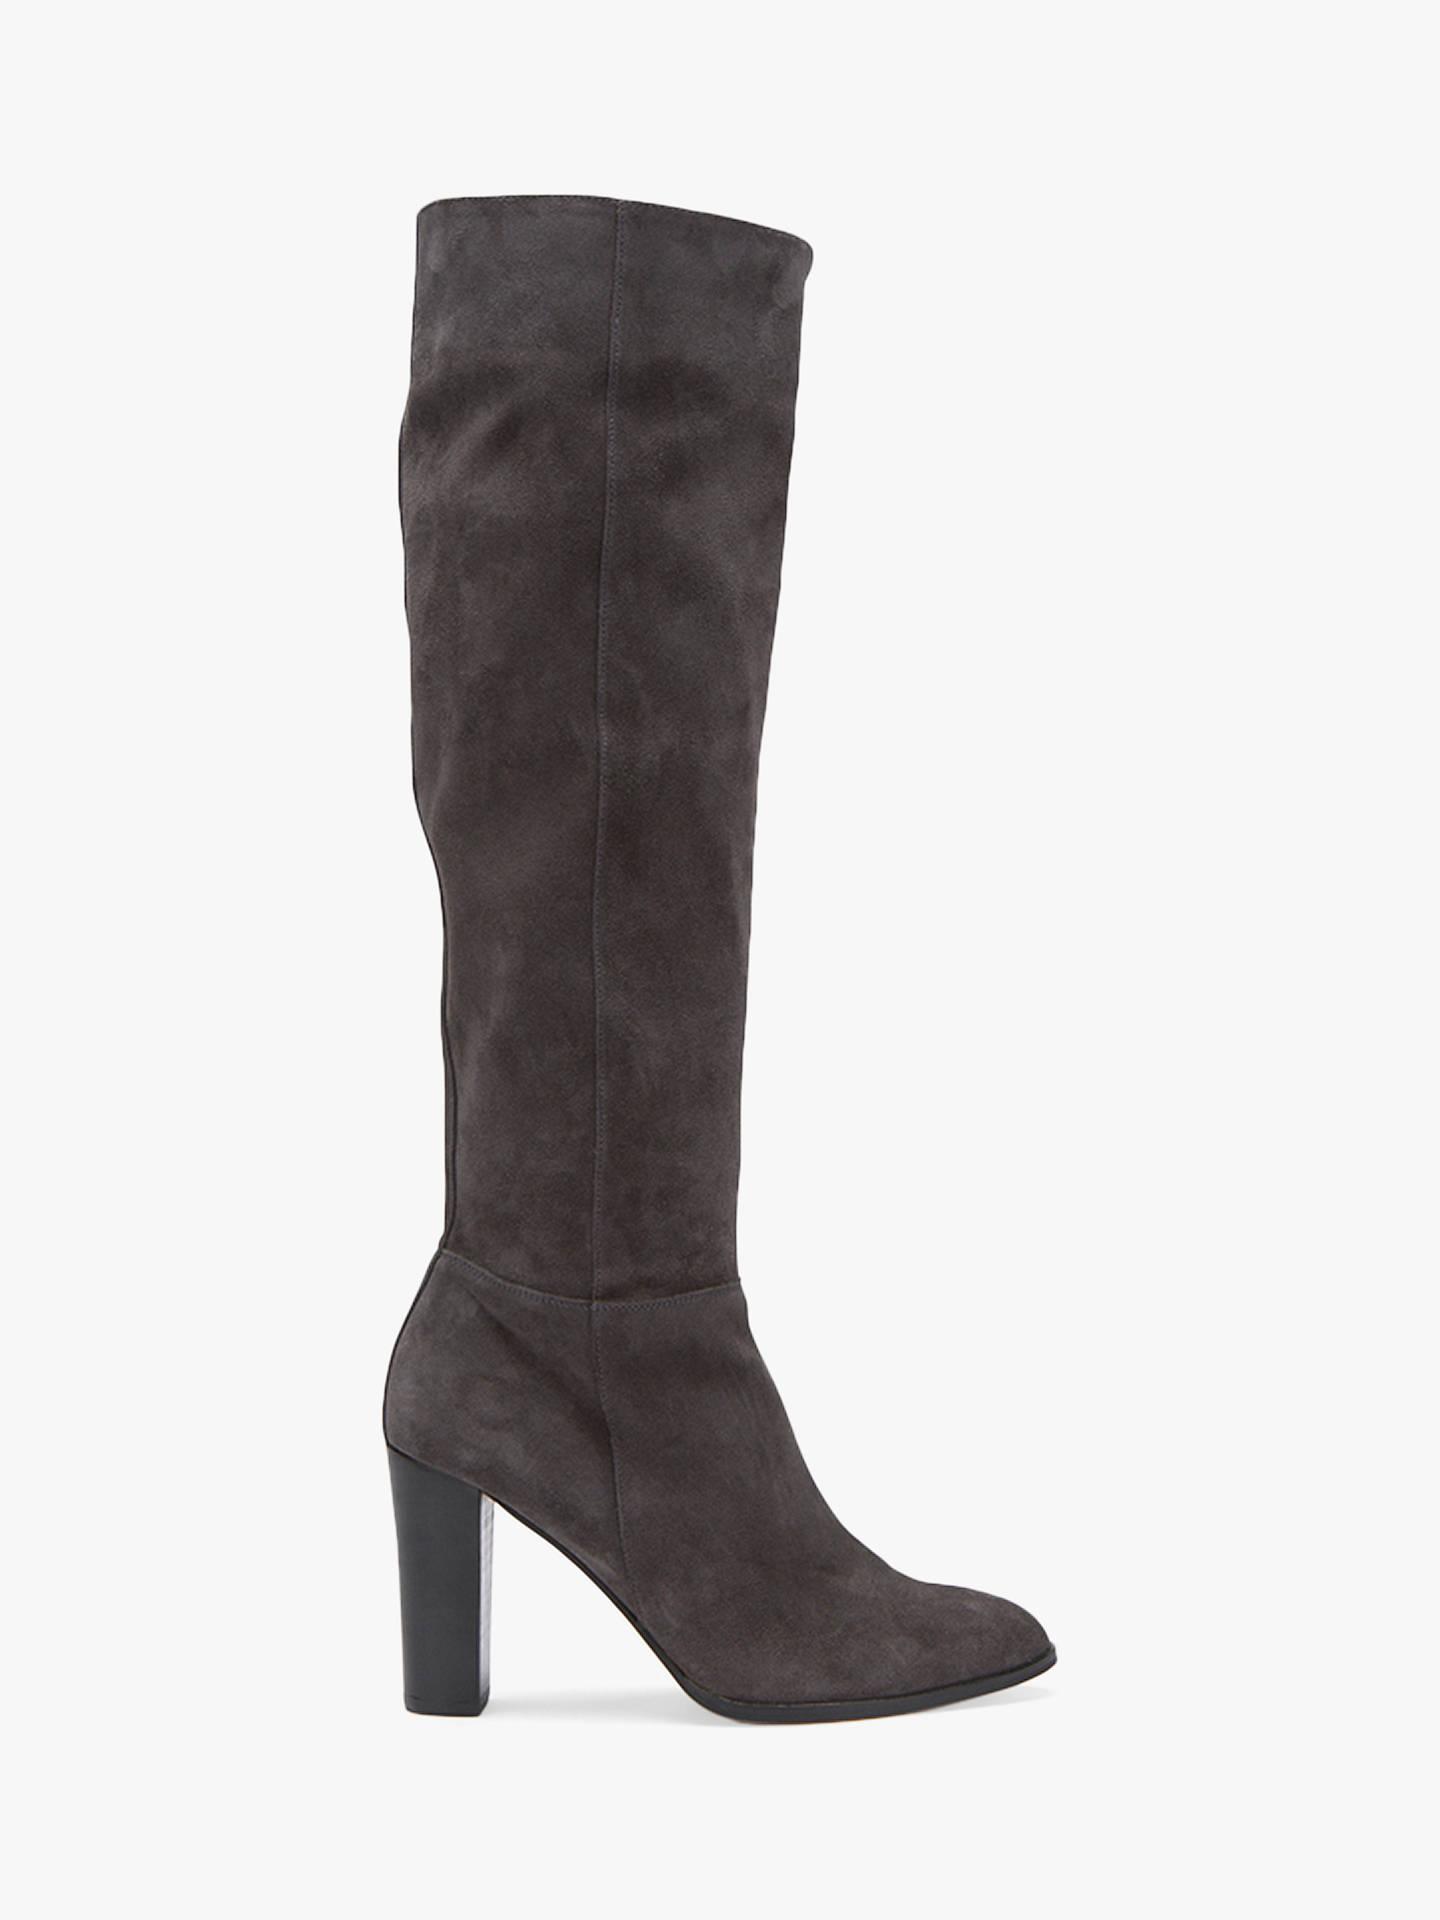 d0aa3ab28c7 Mint Velvet Faith Block Heel Knee High Boots at John Lewis & Partners